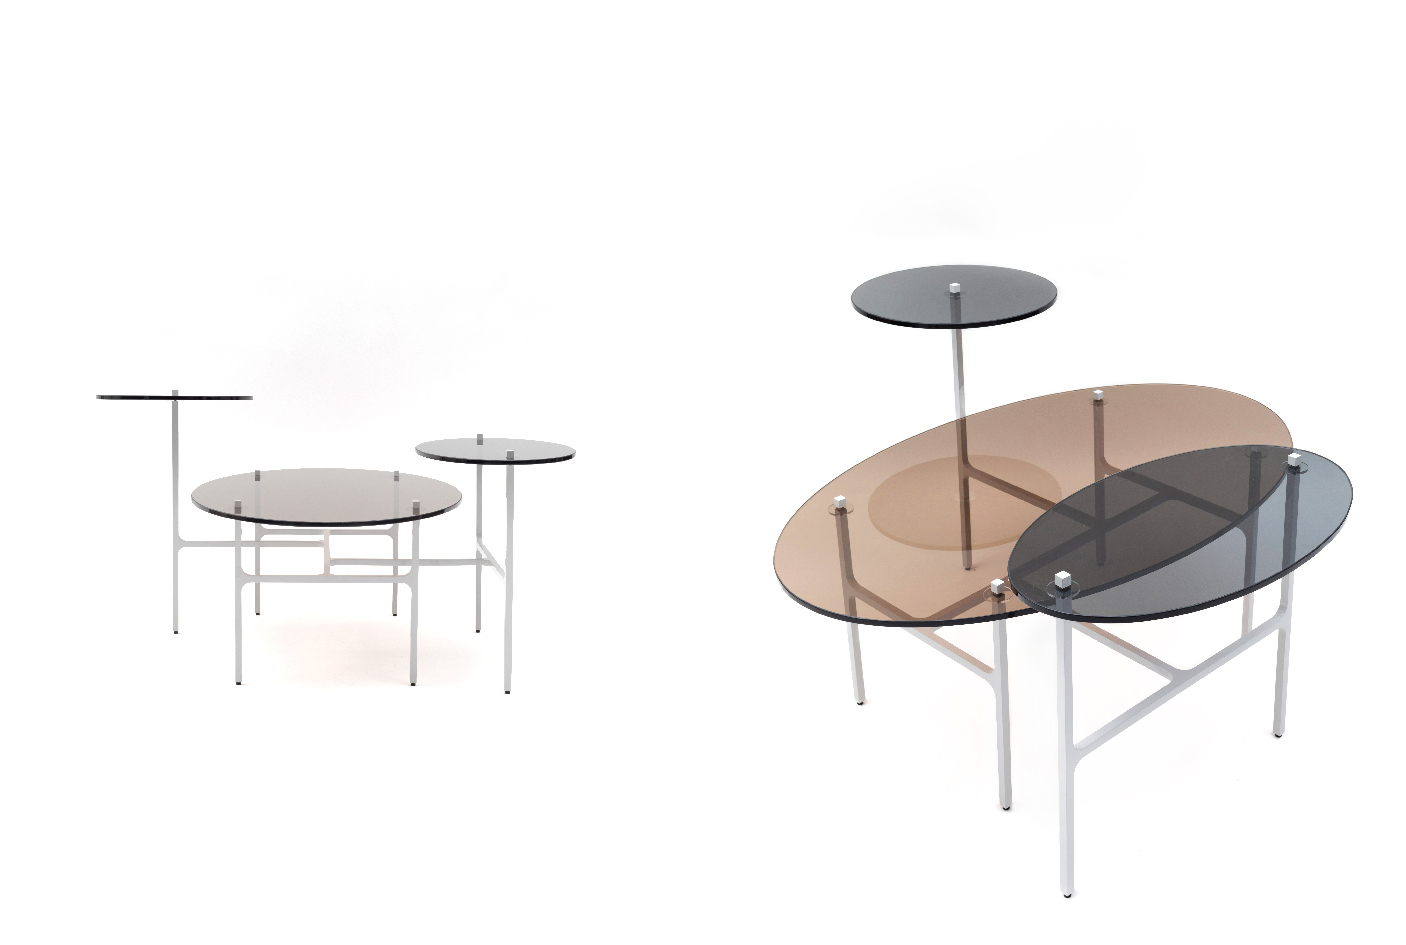 Luna Nesting Table_Comp2-01.jpg